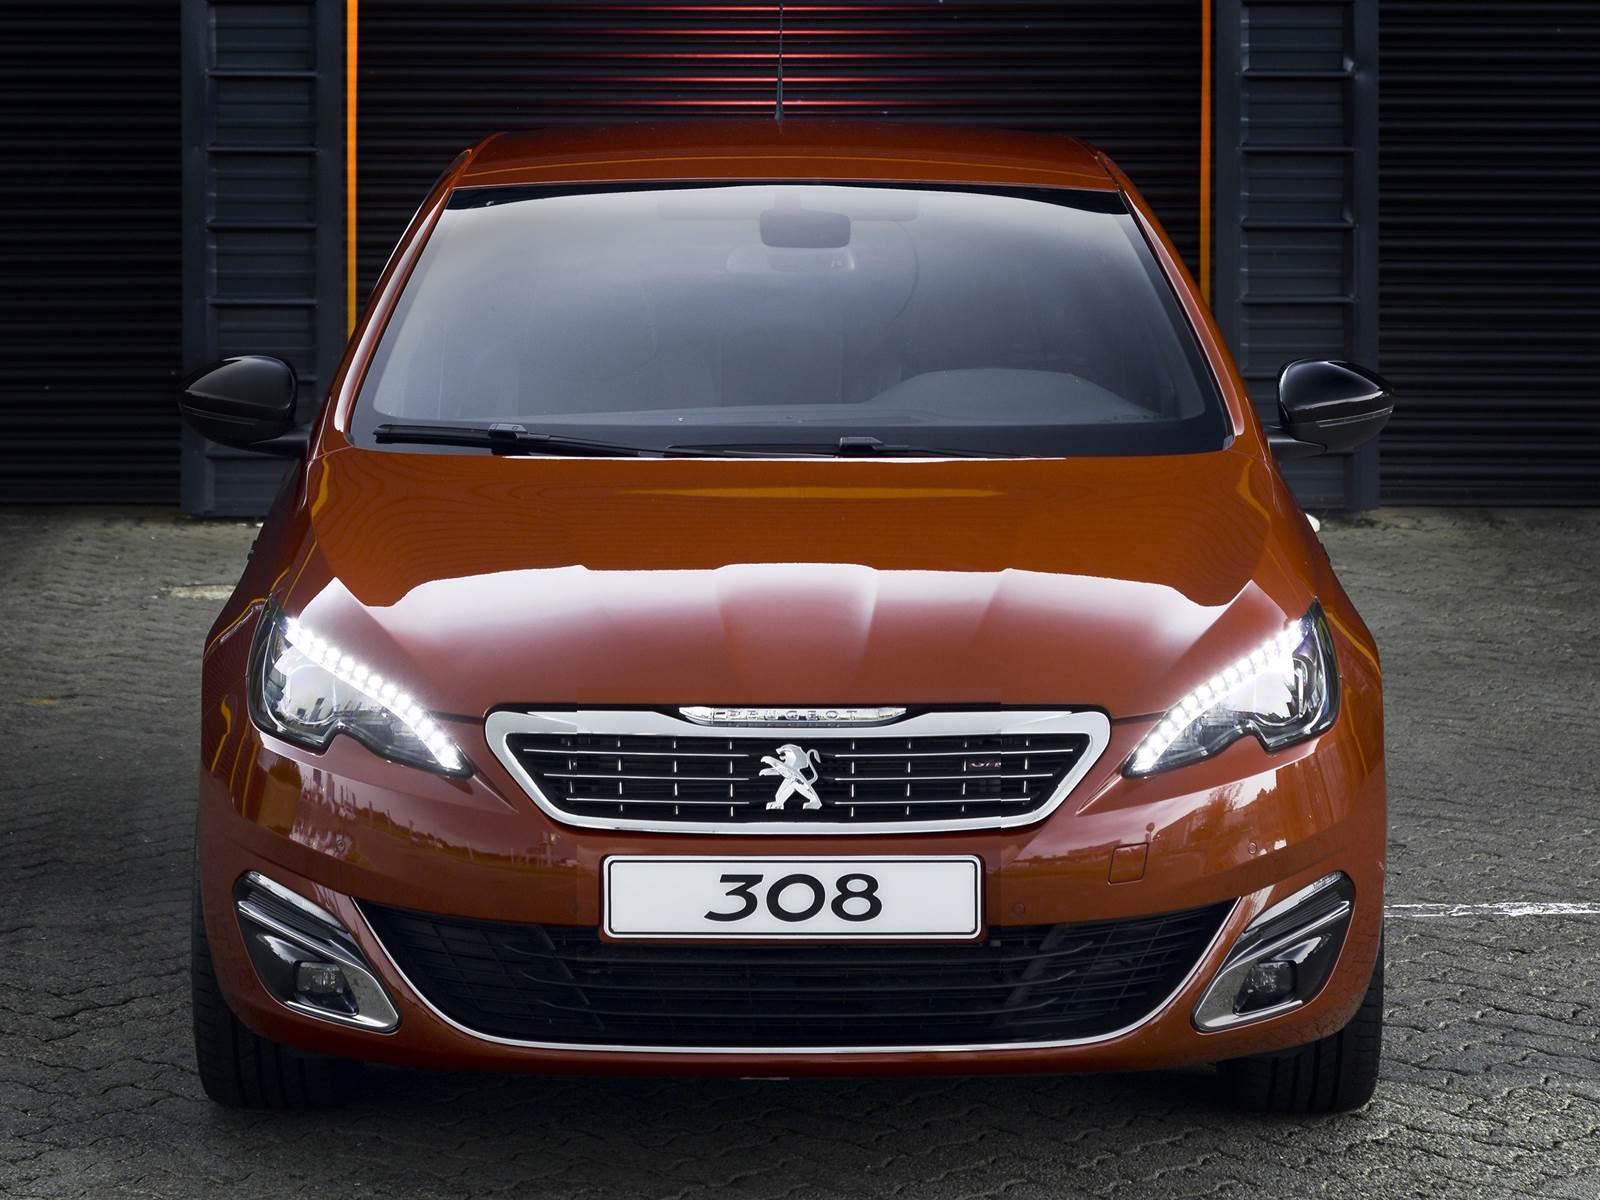 Novo Peugeot 308 Chega Ao Brasil No Segundo Semestre